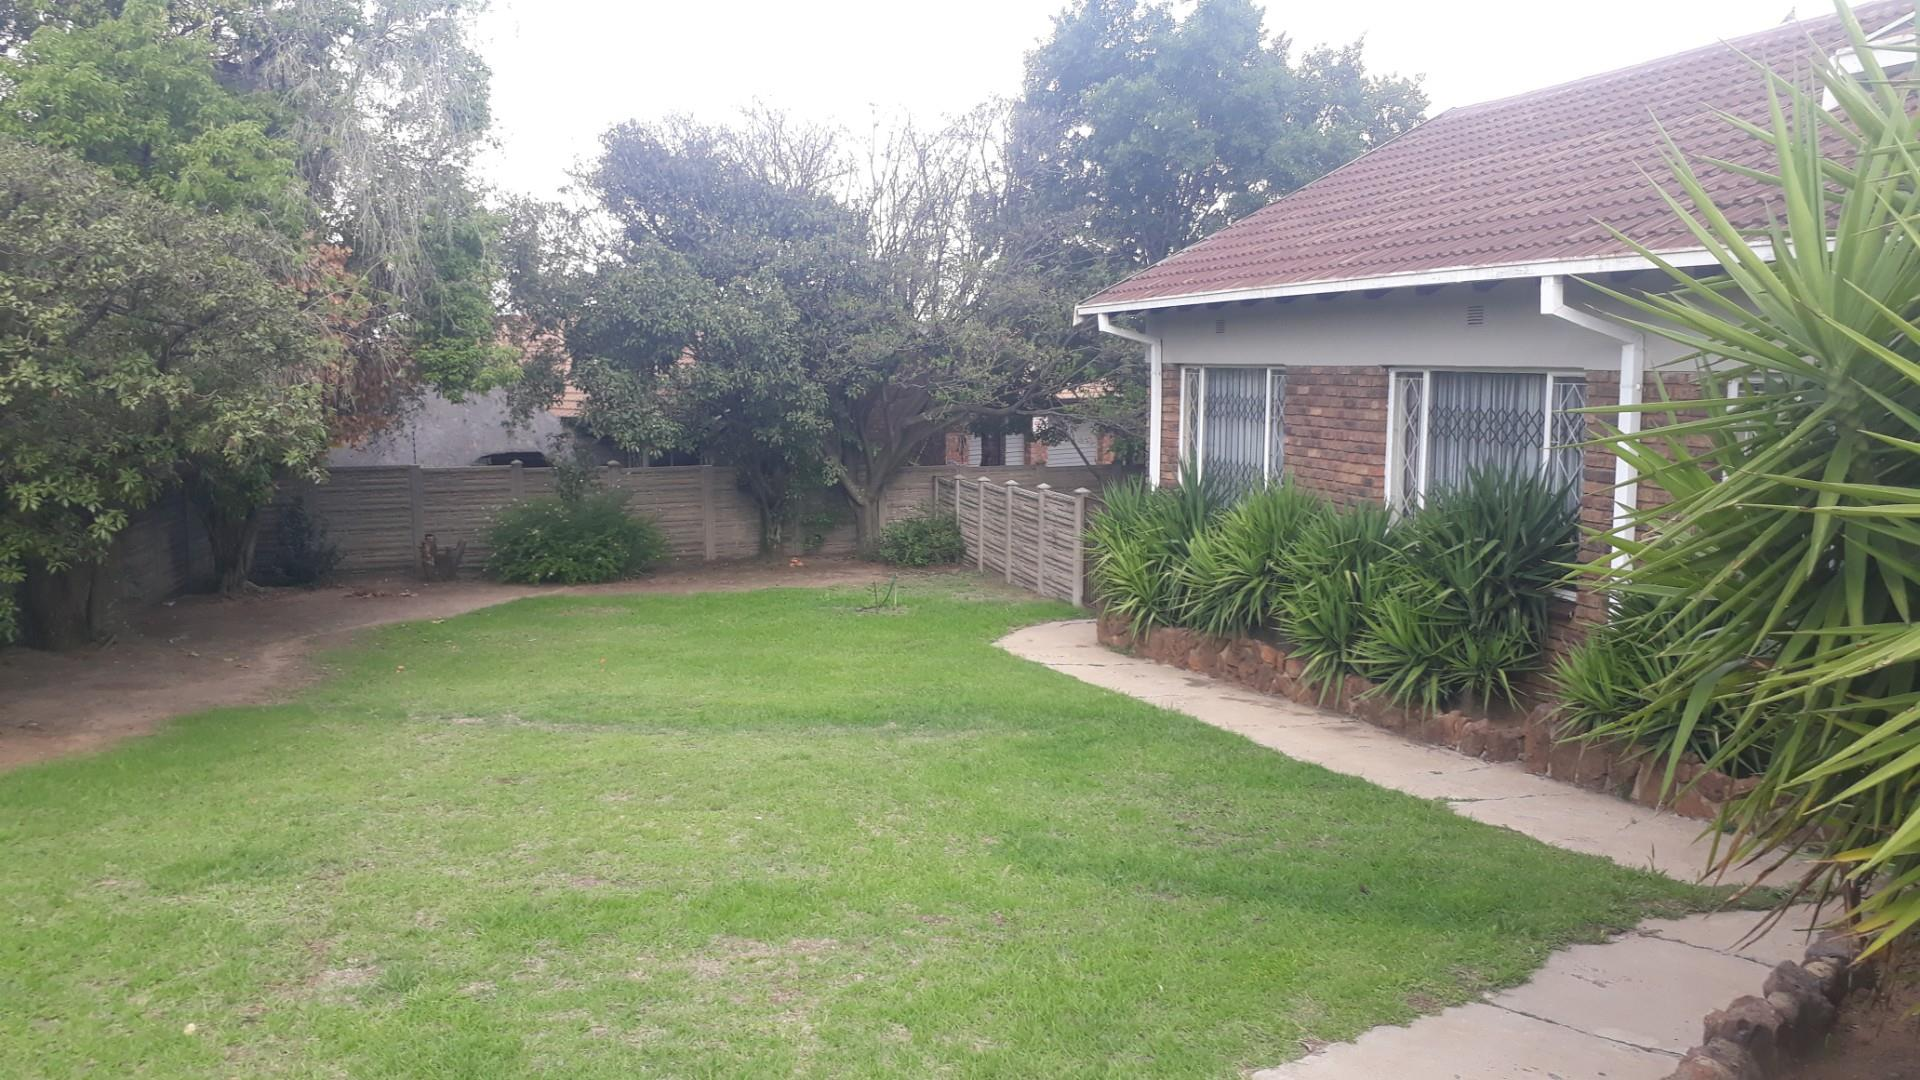 4 Bedroom House To Rent in Model Park